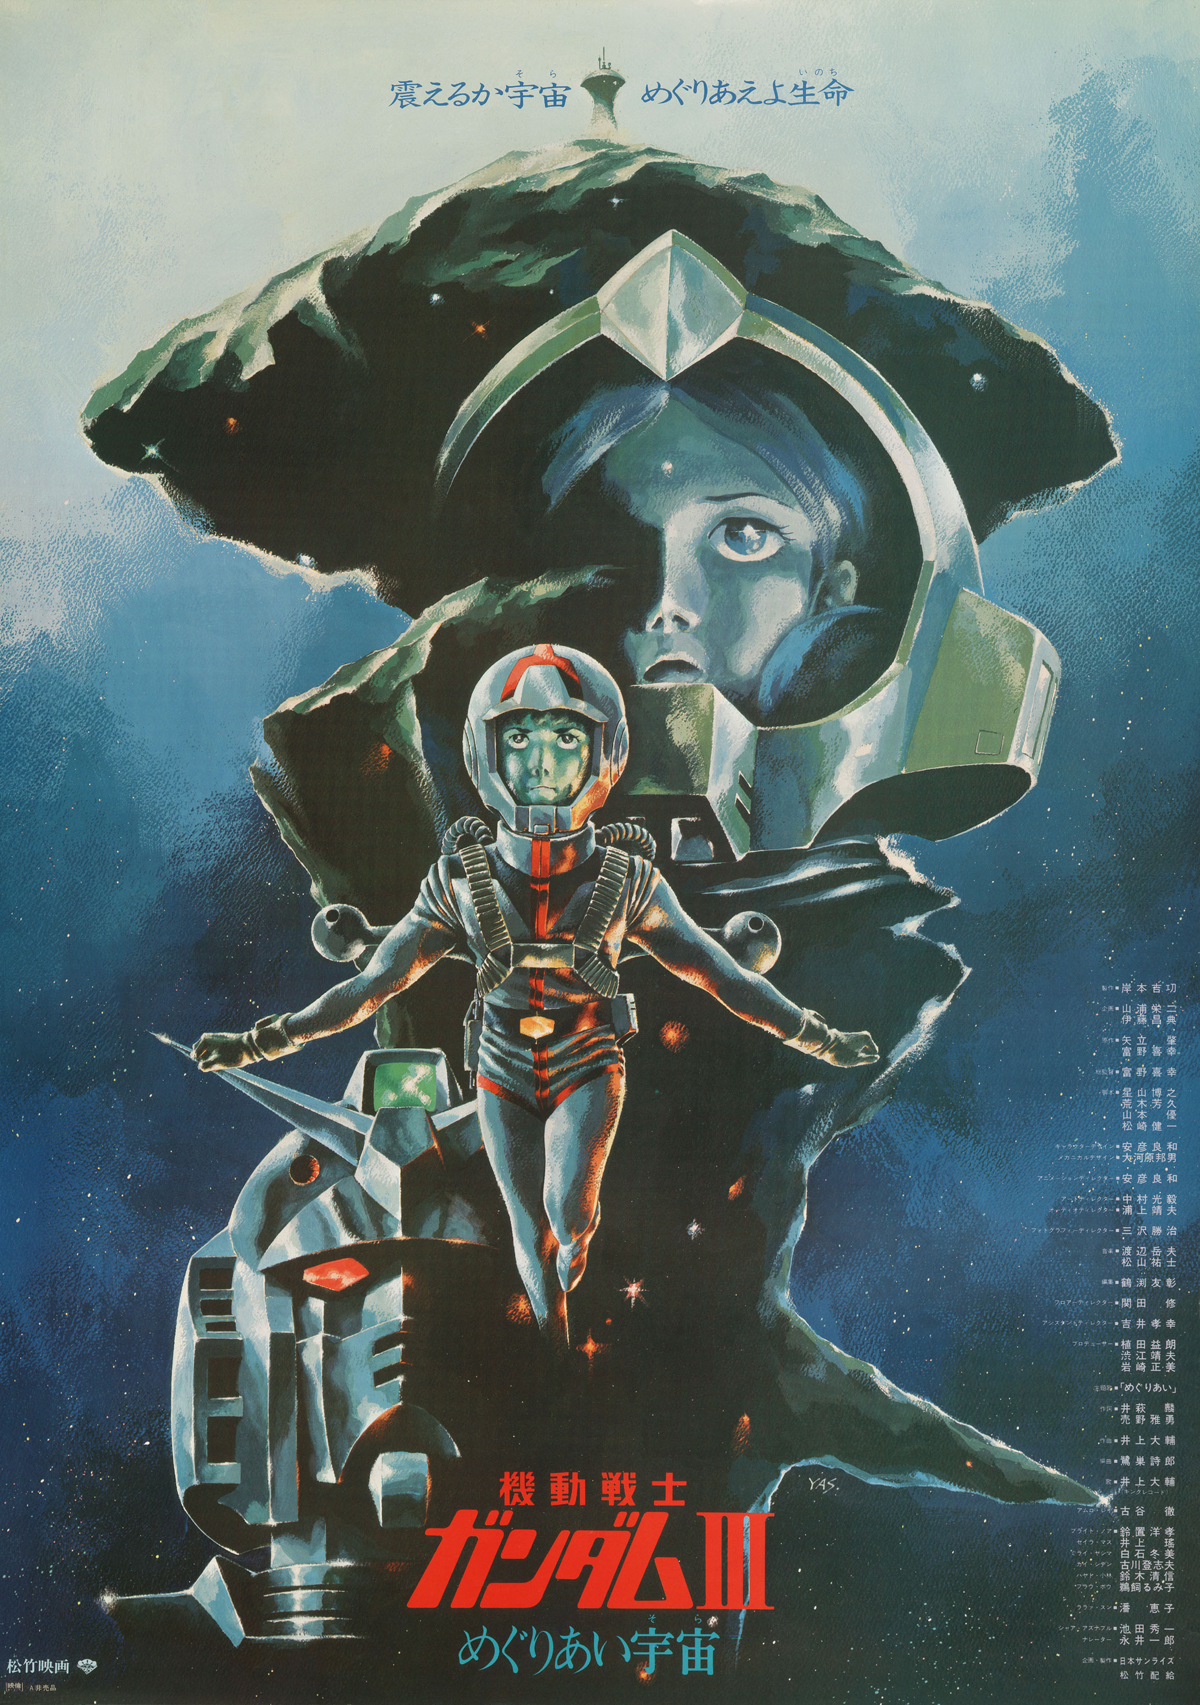 Mobile Suit Gundam III: Encounters in Space (1982) - IMDb